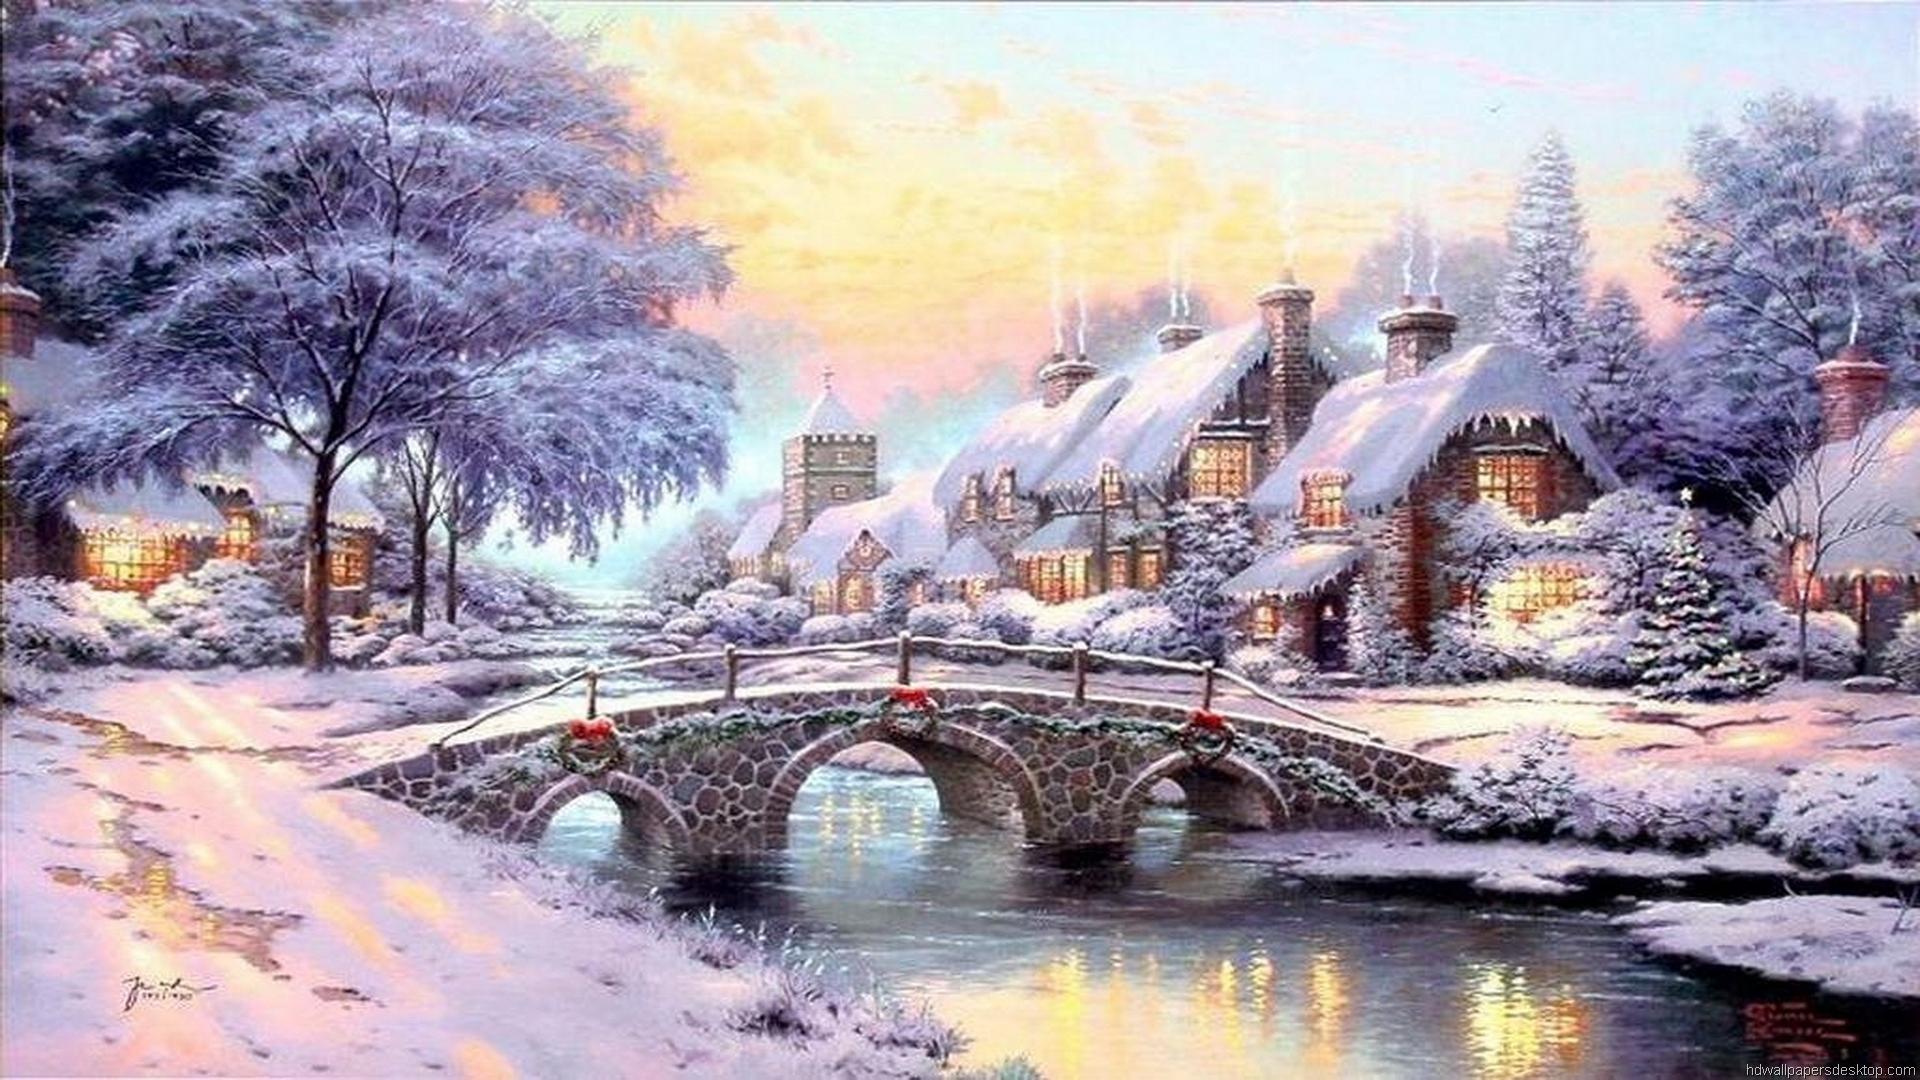 thomas kinkade christmas village | thomas kinkade wallpaper